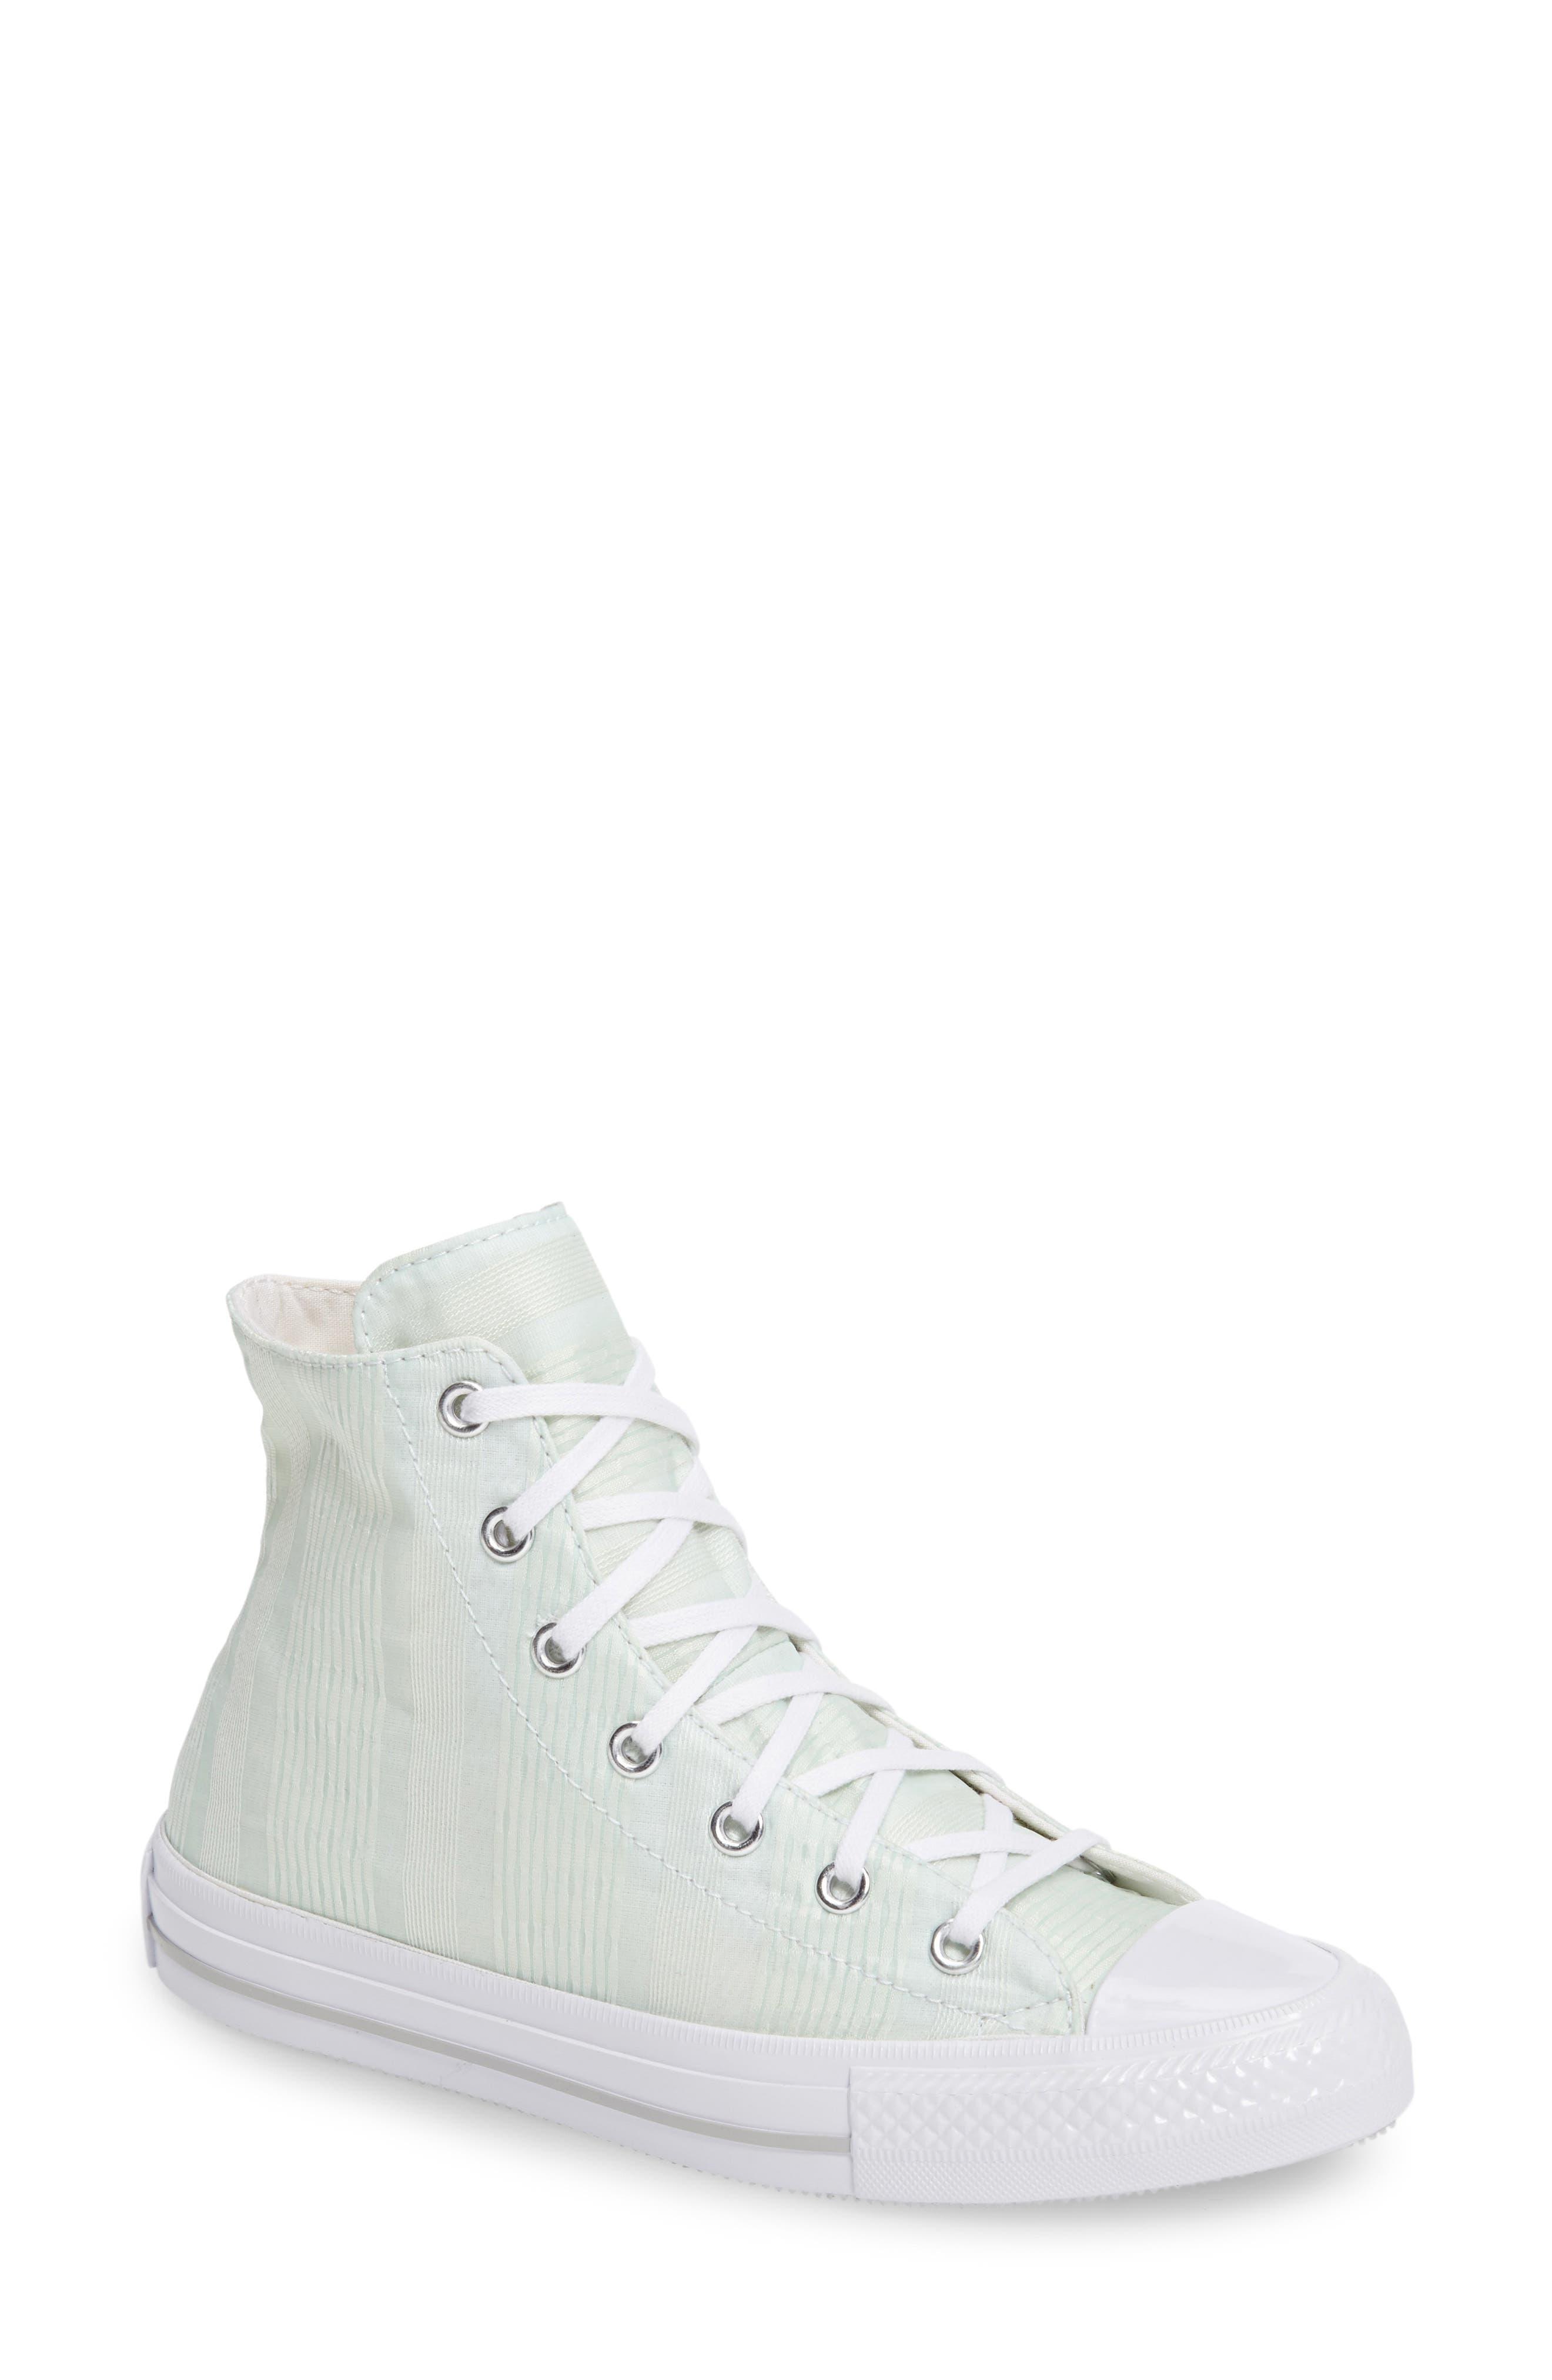 Alternate Image 1 Selected - Converse Chuck Taylor® All Star® Gemma High Top Sneaker (Women)